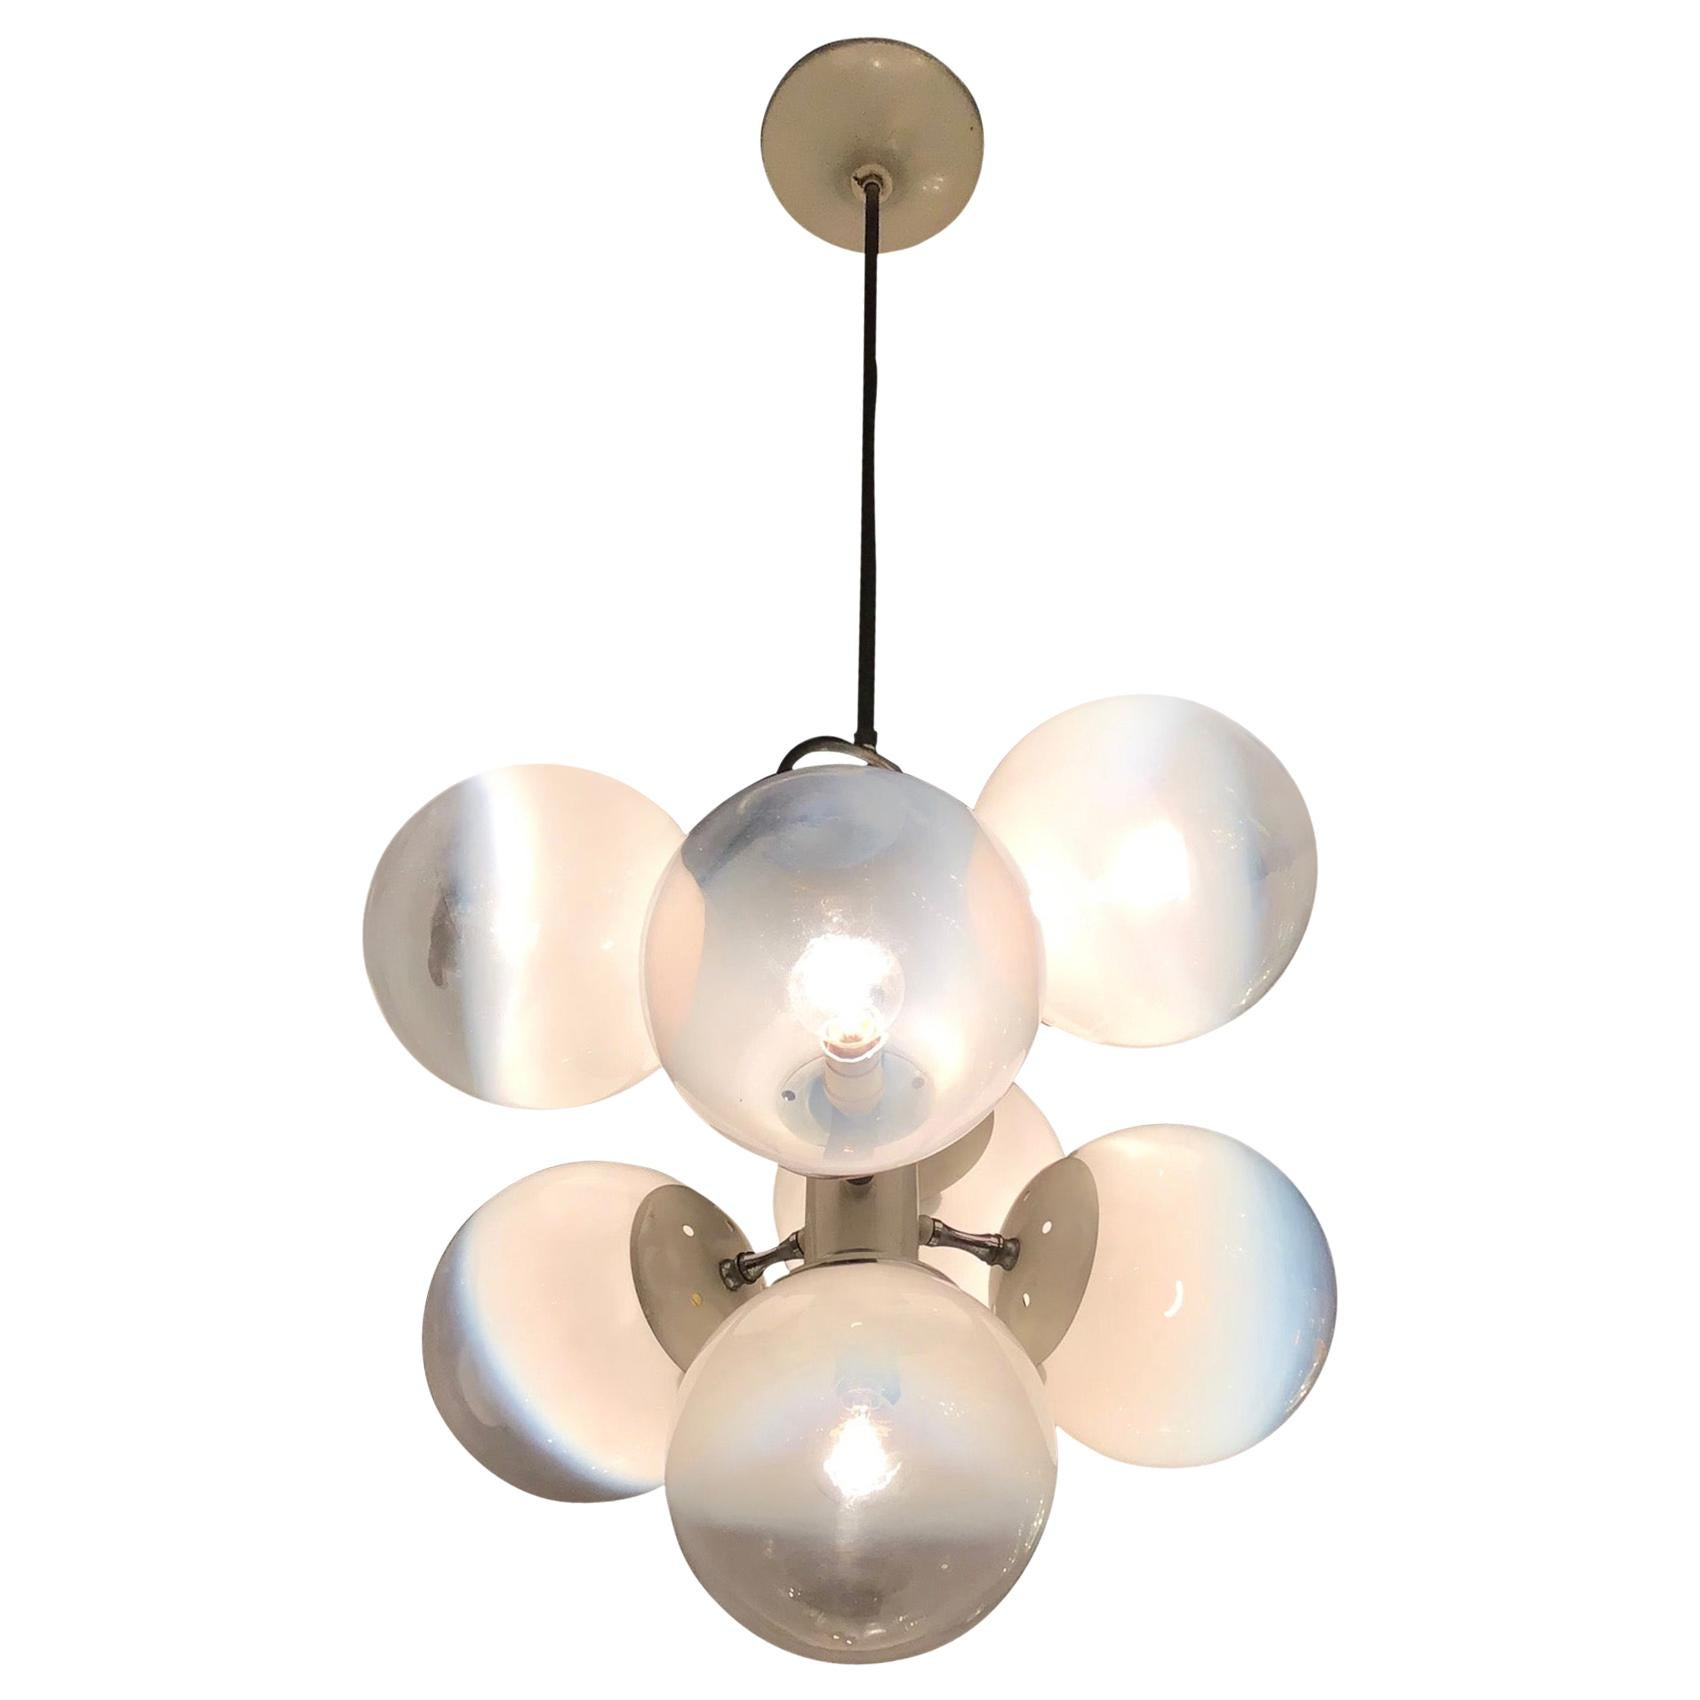 Stilnovo Style Chandelier Glass Metal Crome 7 Lights, 1960, Italy